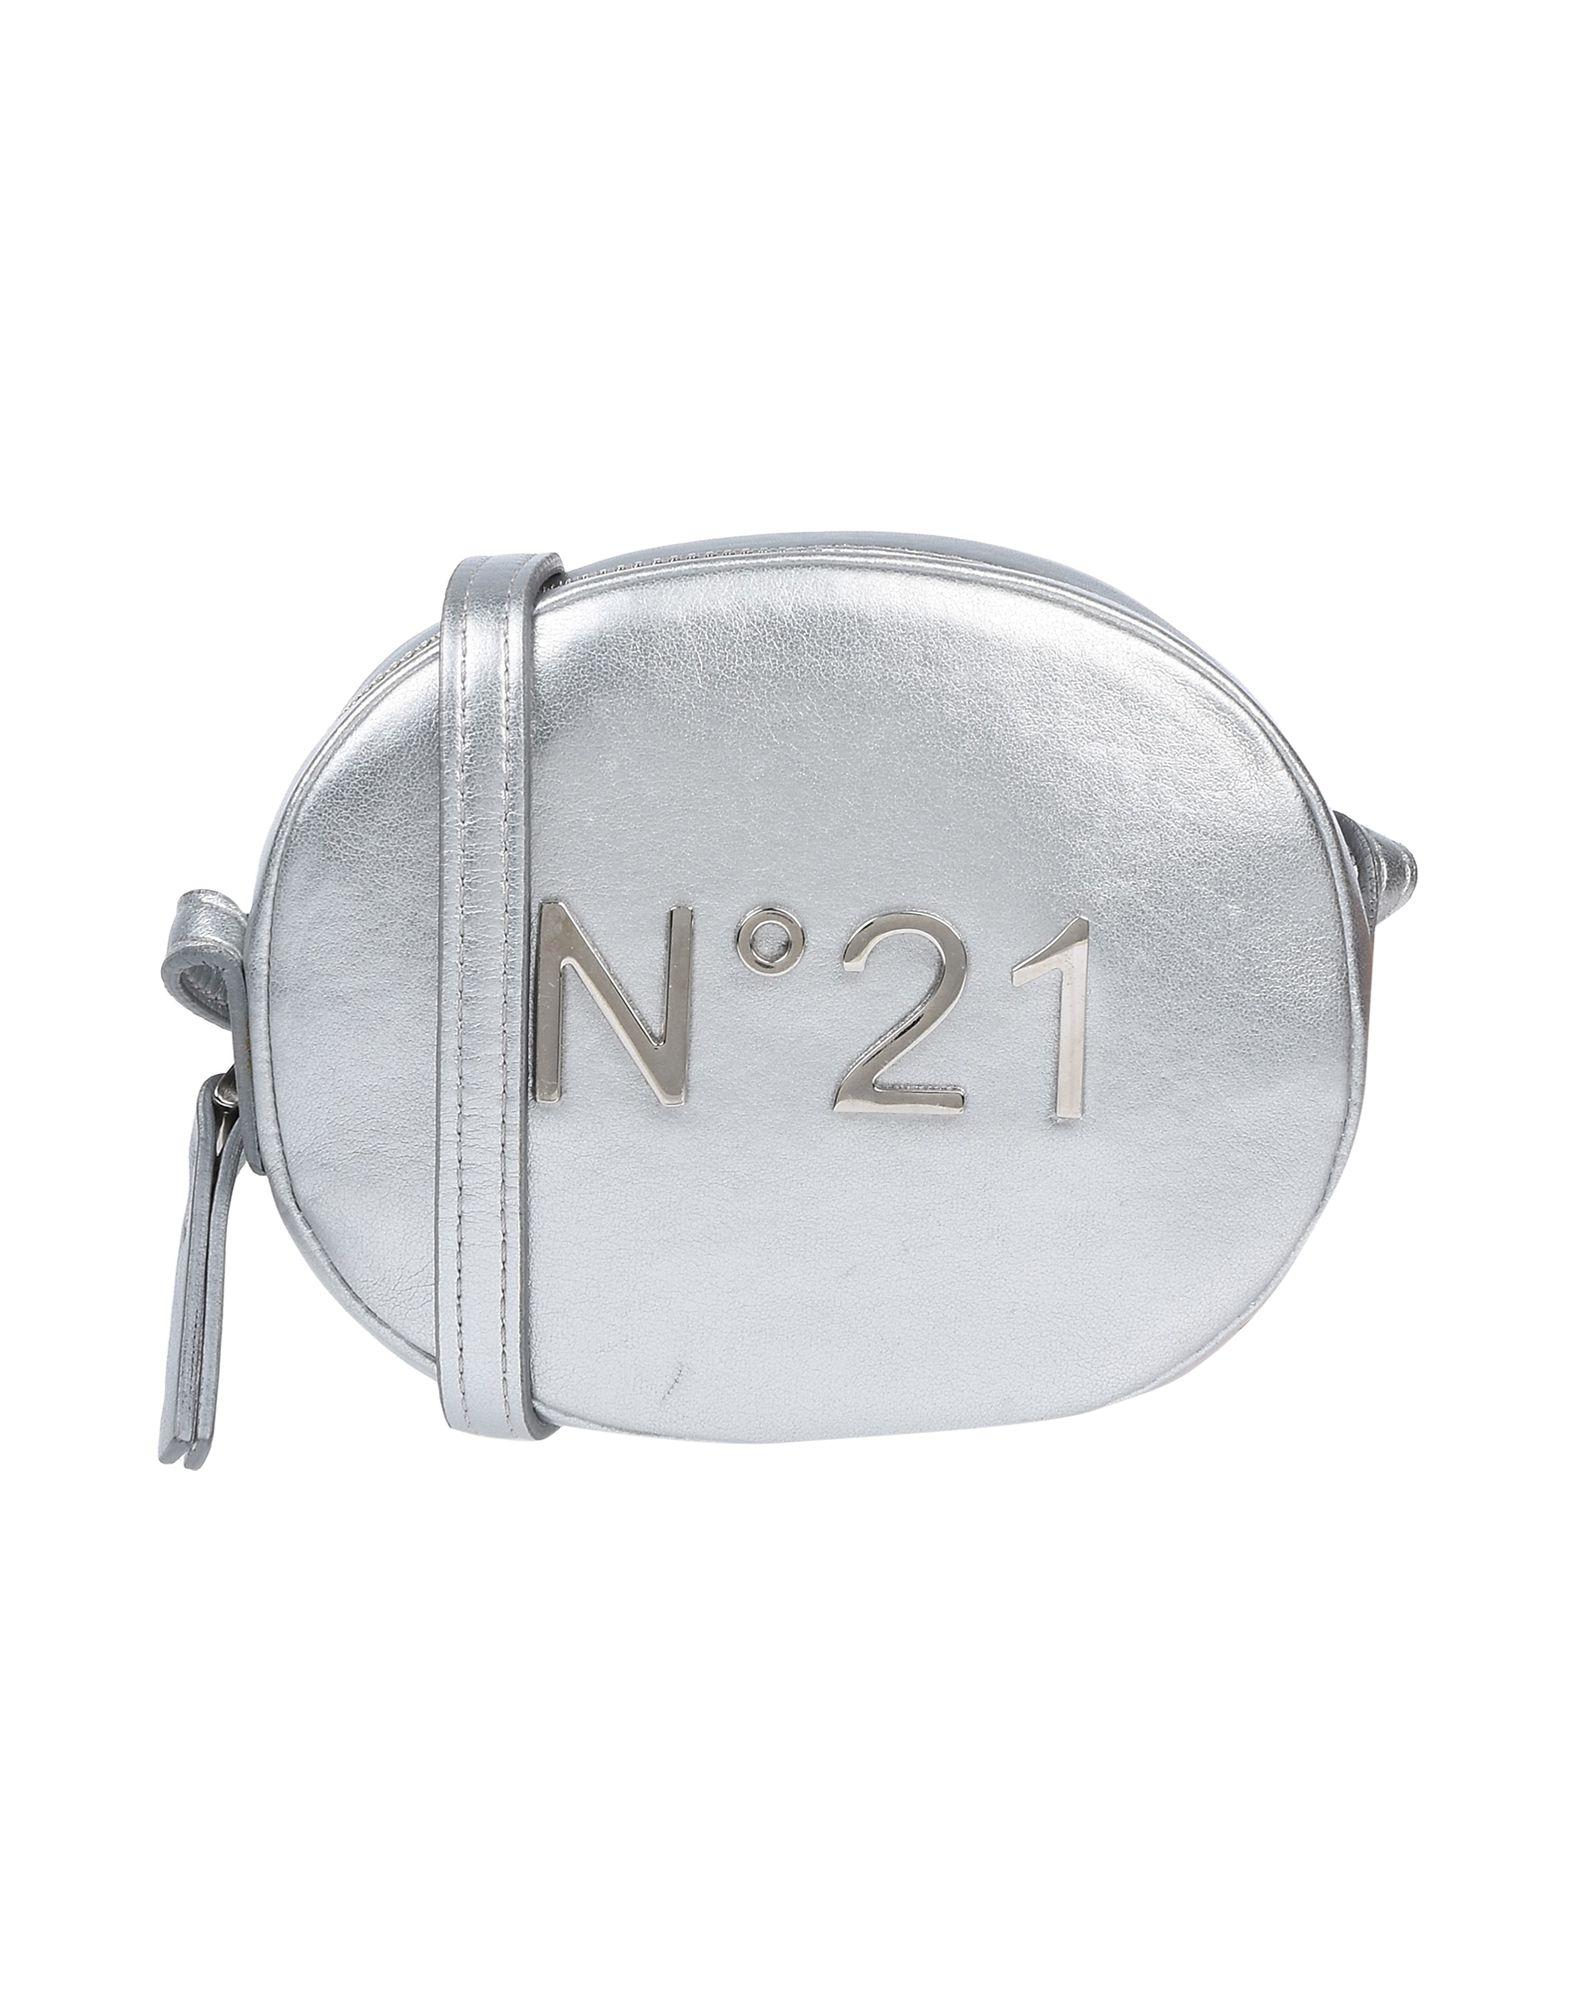 N°21 Сумка через плечо сумка через плечо anais gvani croco ag 1471 350161